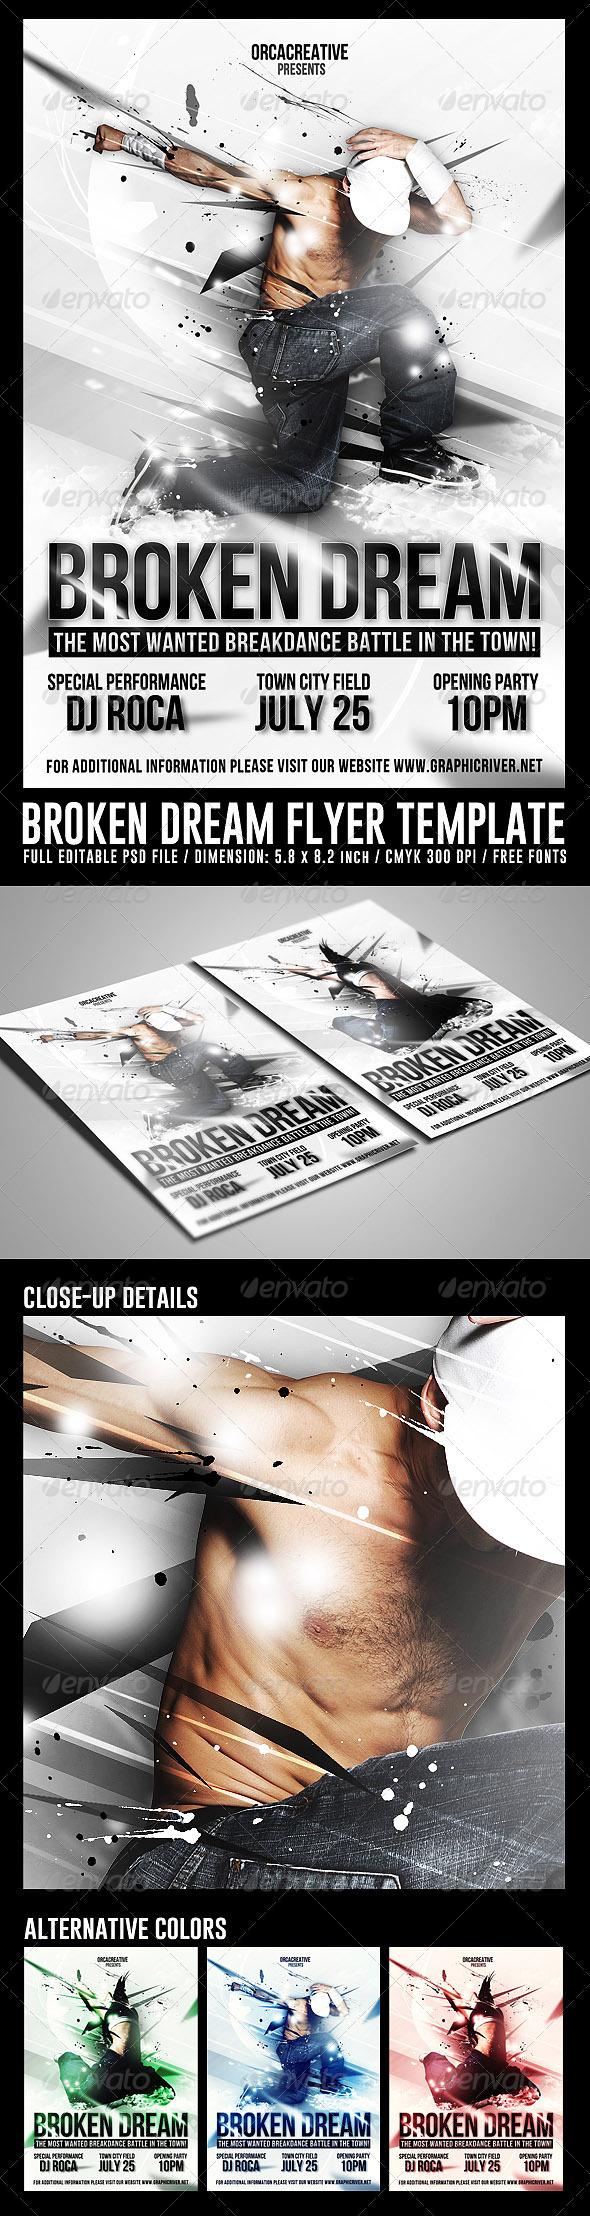 GraphicRiver Broken Dream Flyer Template 8406950